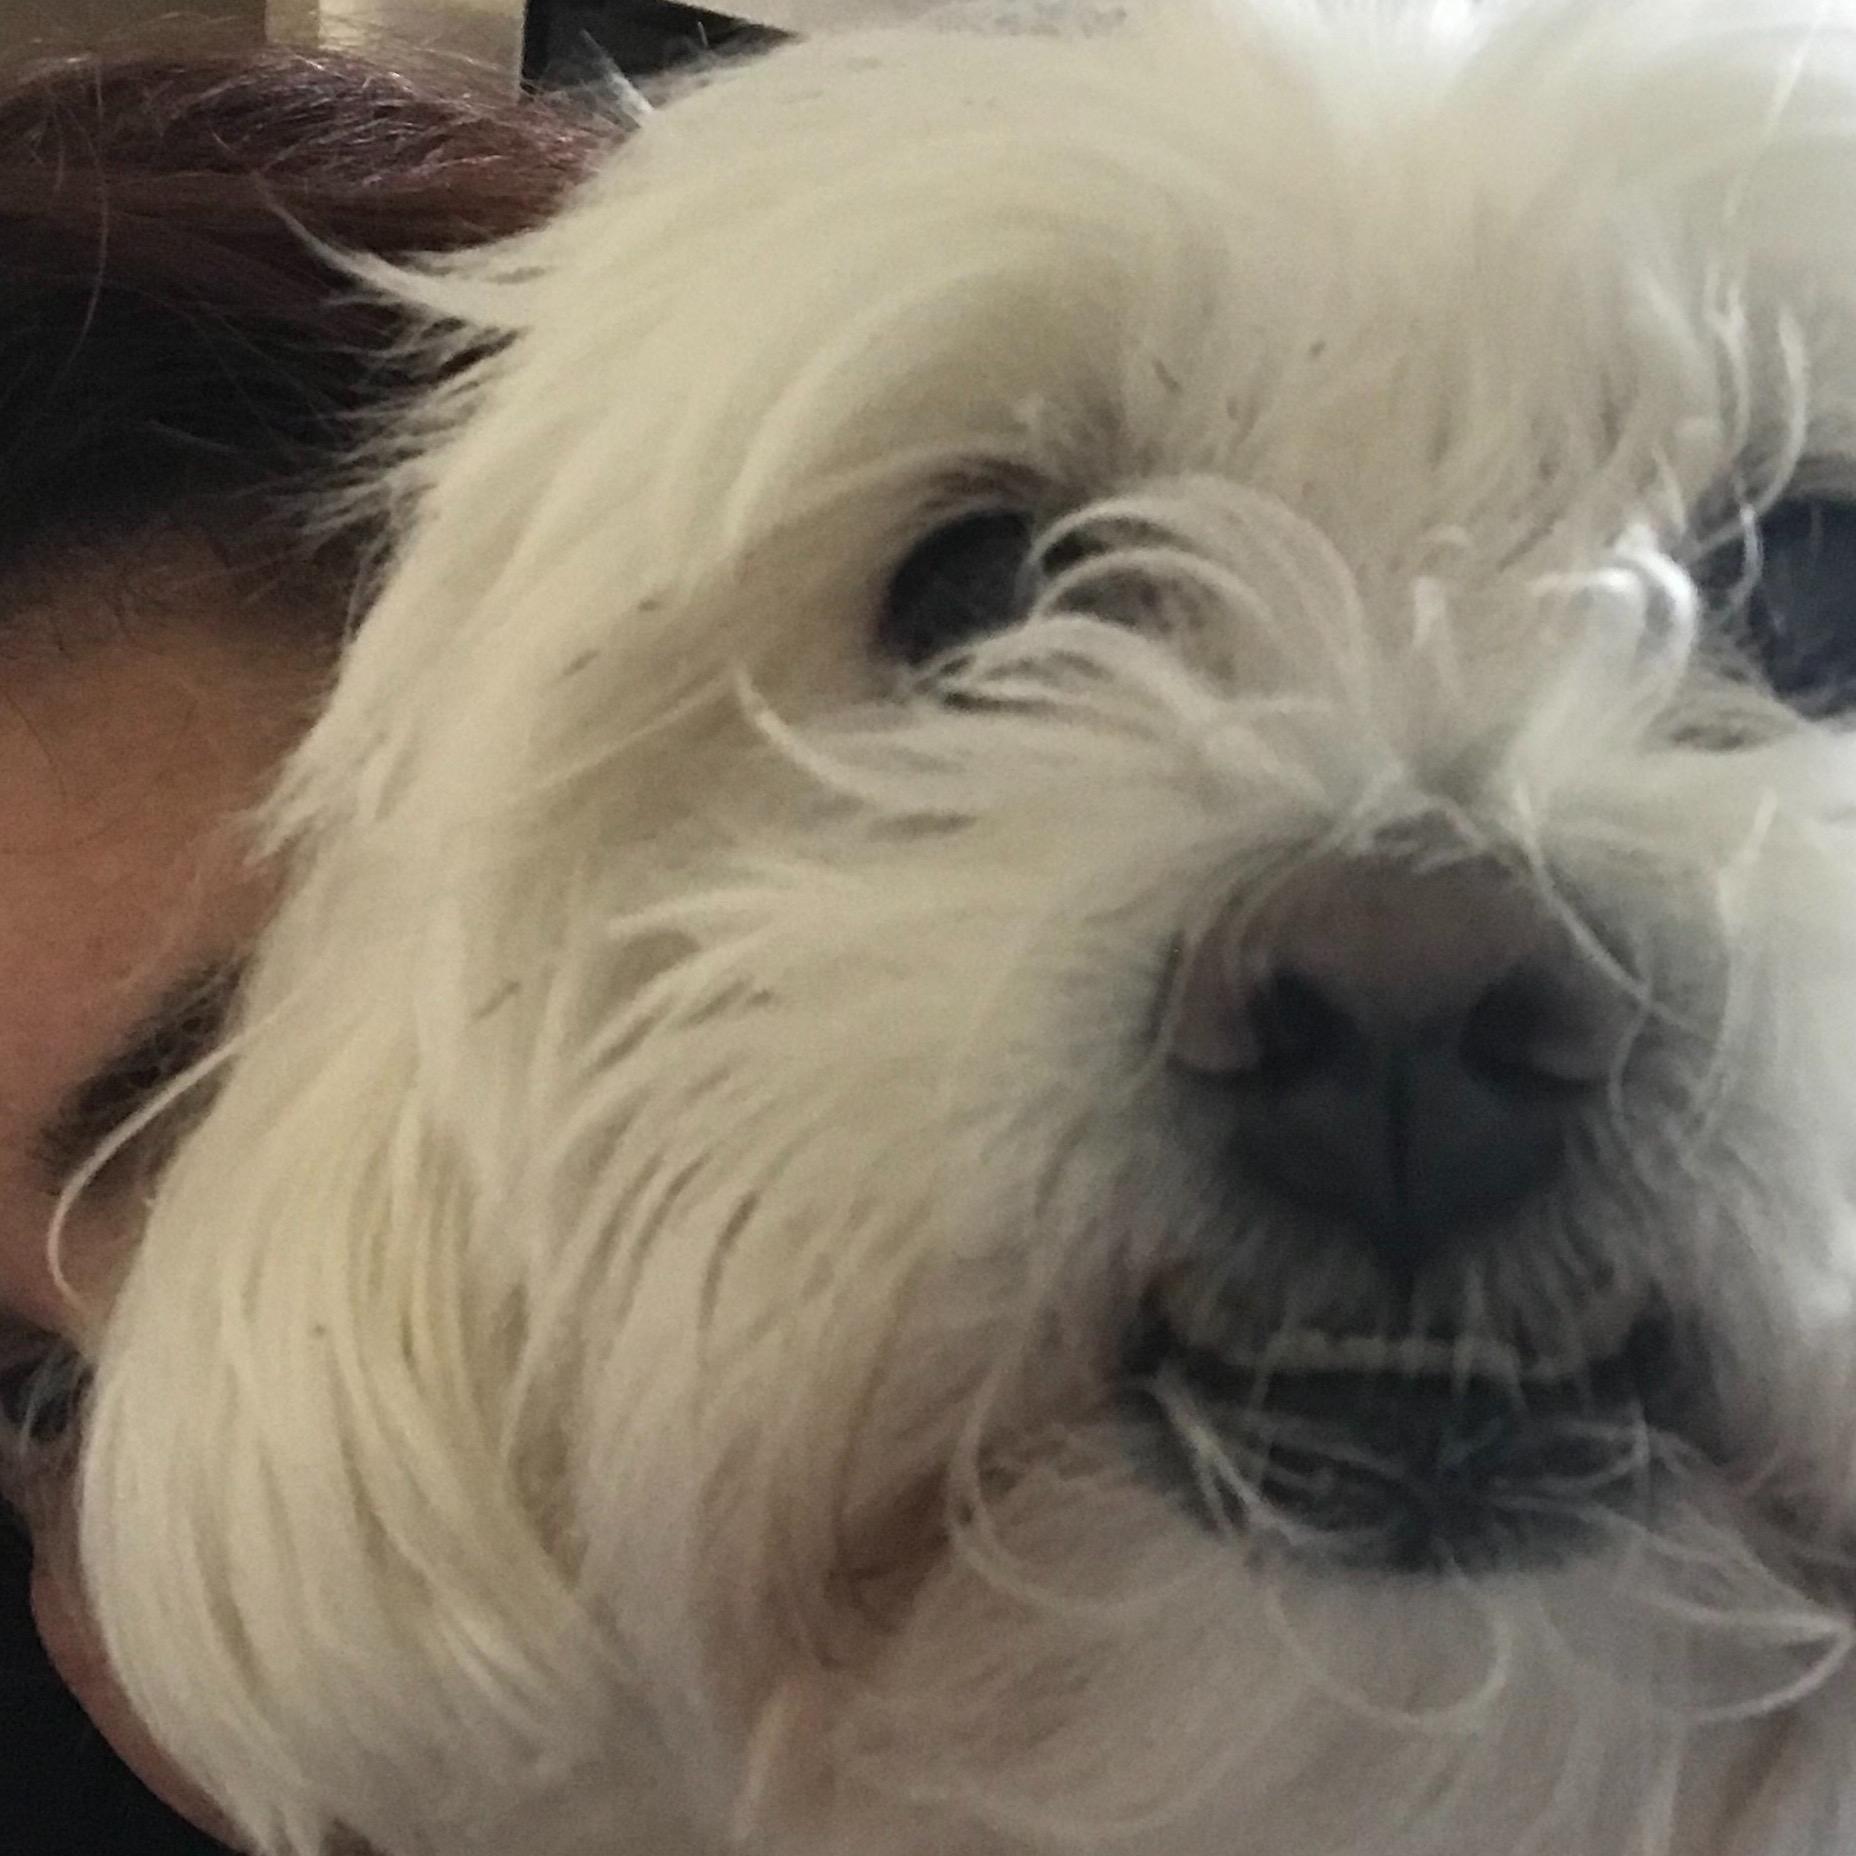 Nayiber's dog day care